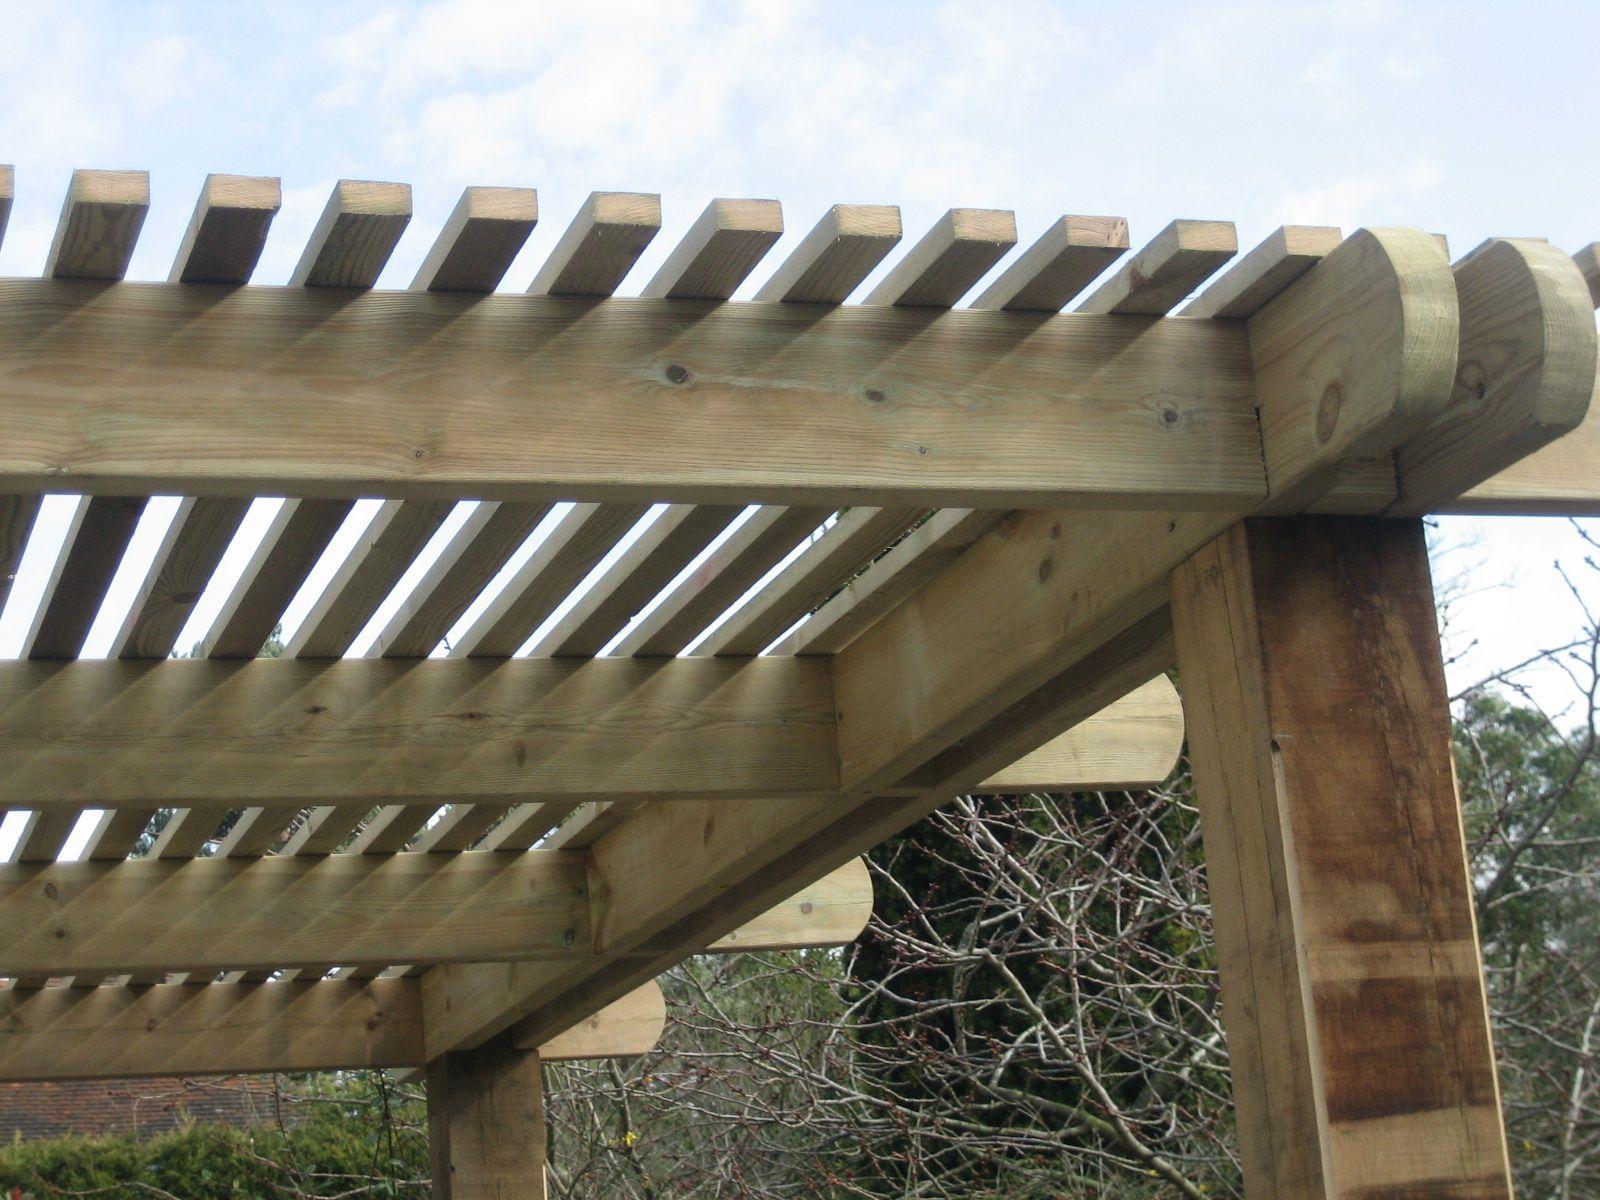 Pergola With Slatted Roof For Shade Pergola Contemporary Garden Pergola Plans